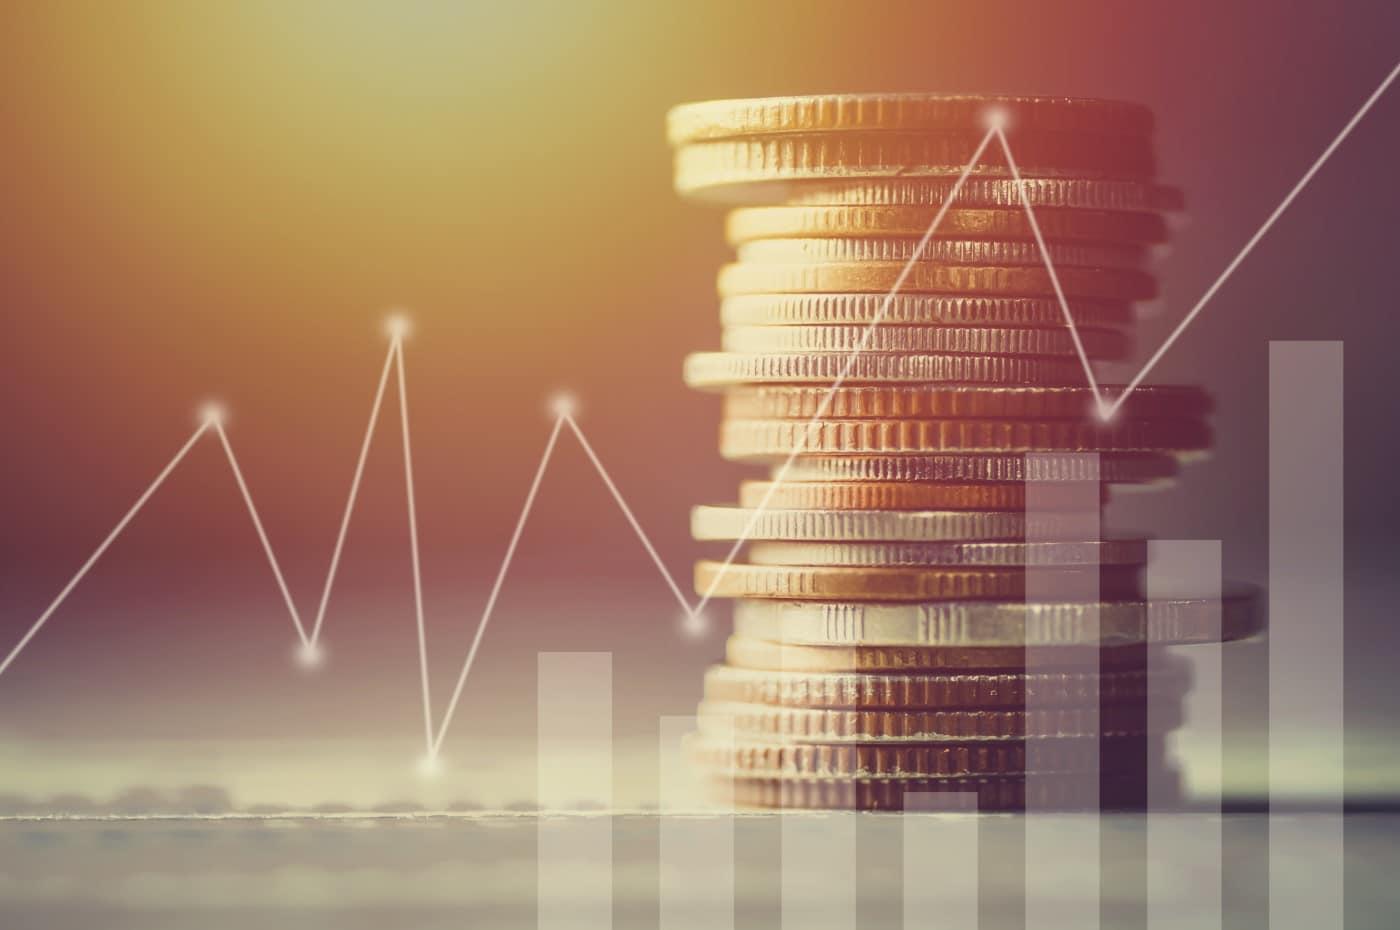 precio-mercado-aumento-alza